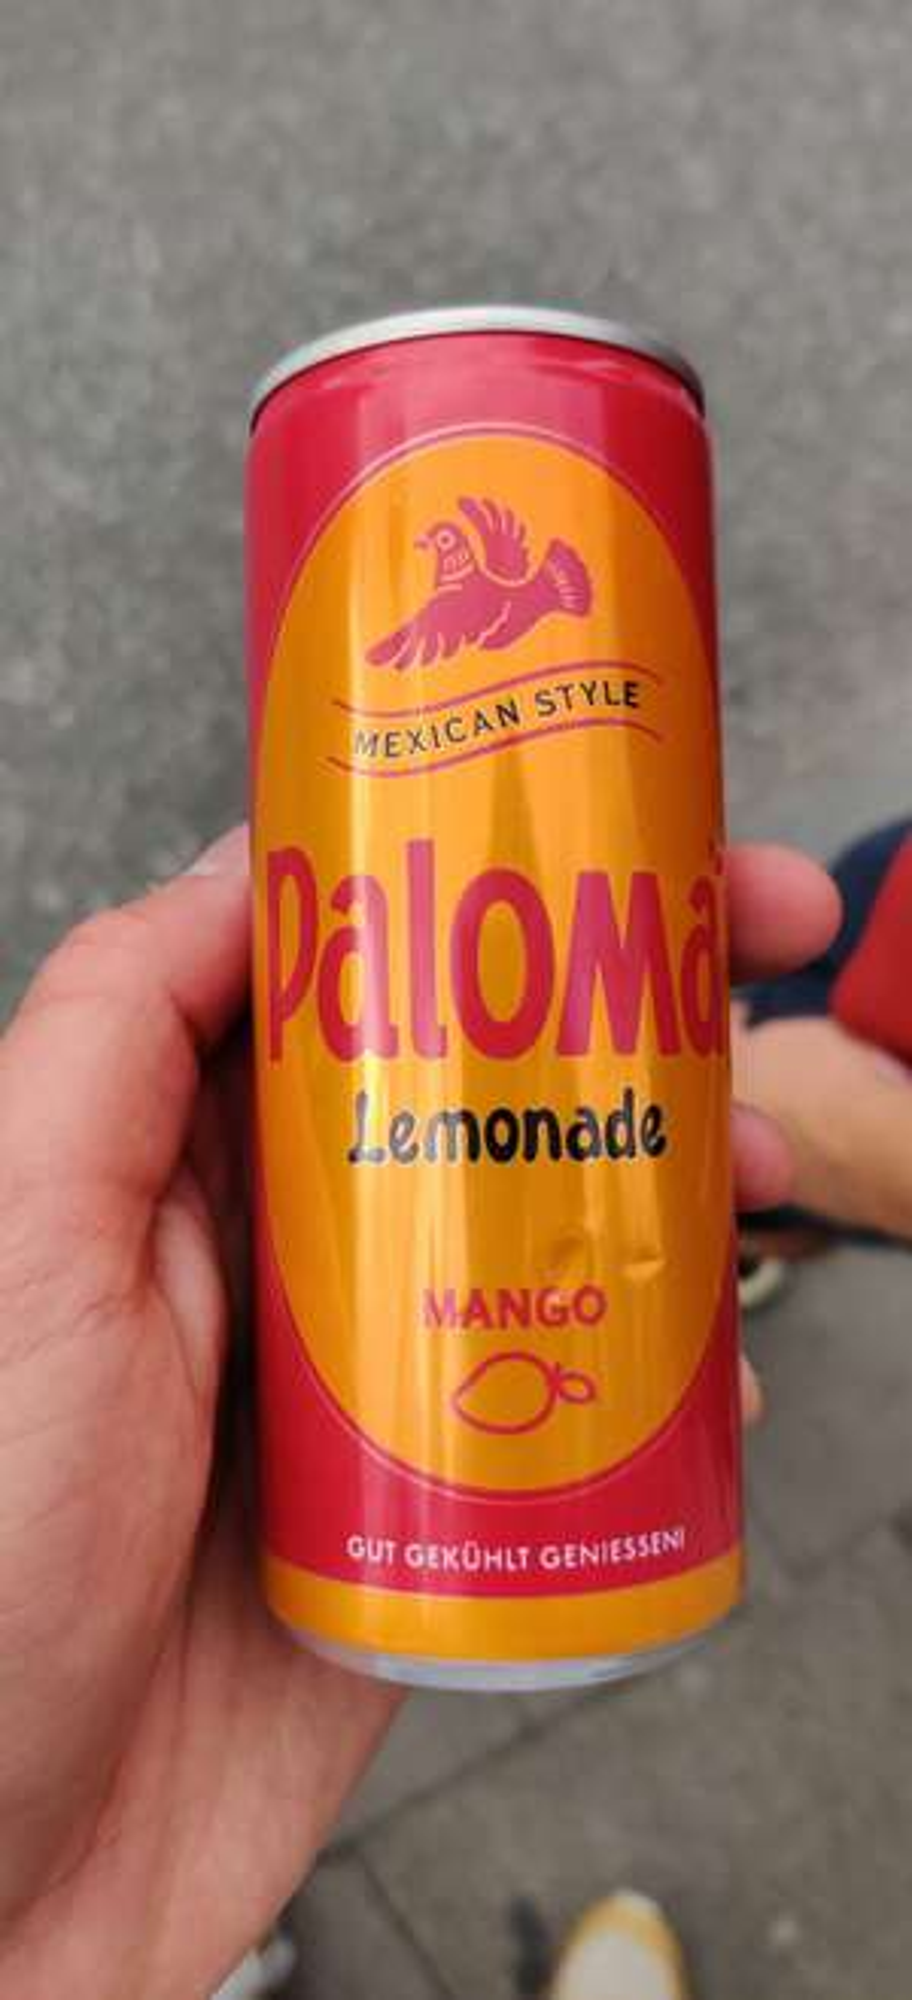 [Lokal Hamburg] Paloma Limonade kostenlos